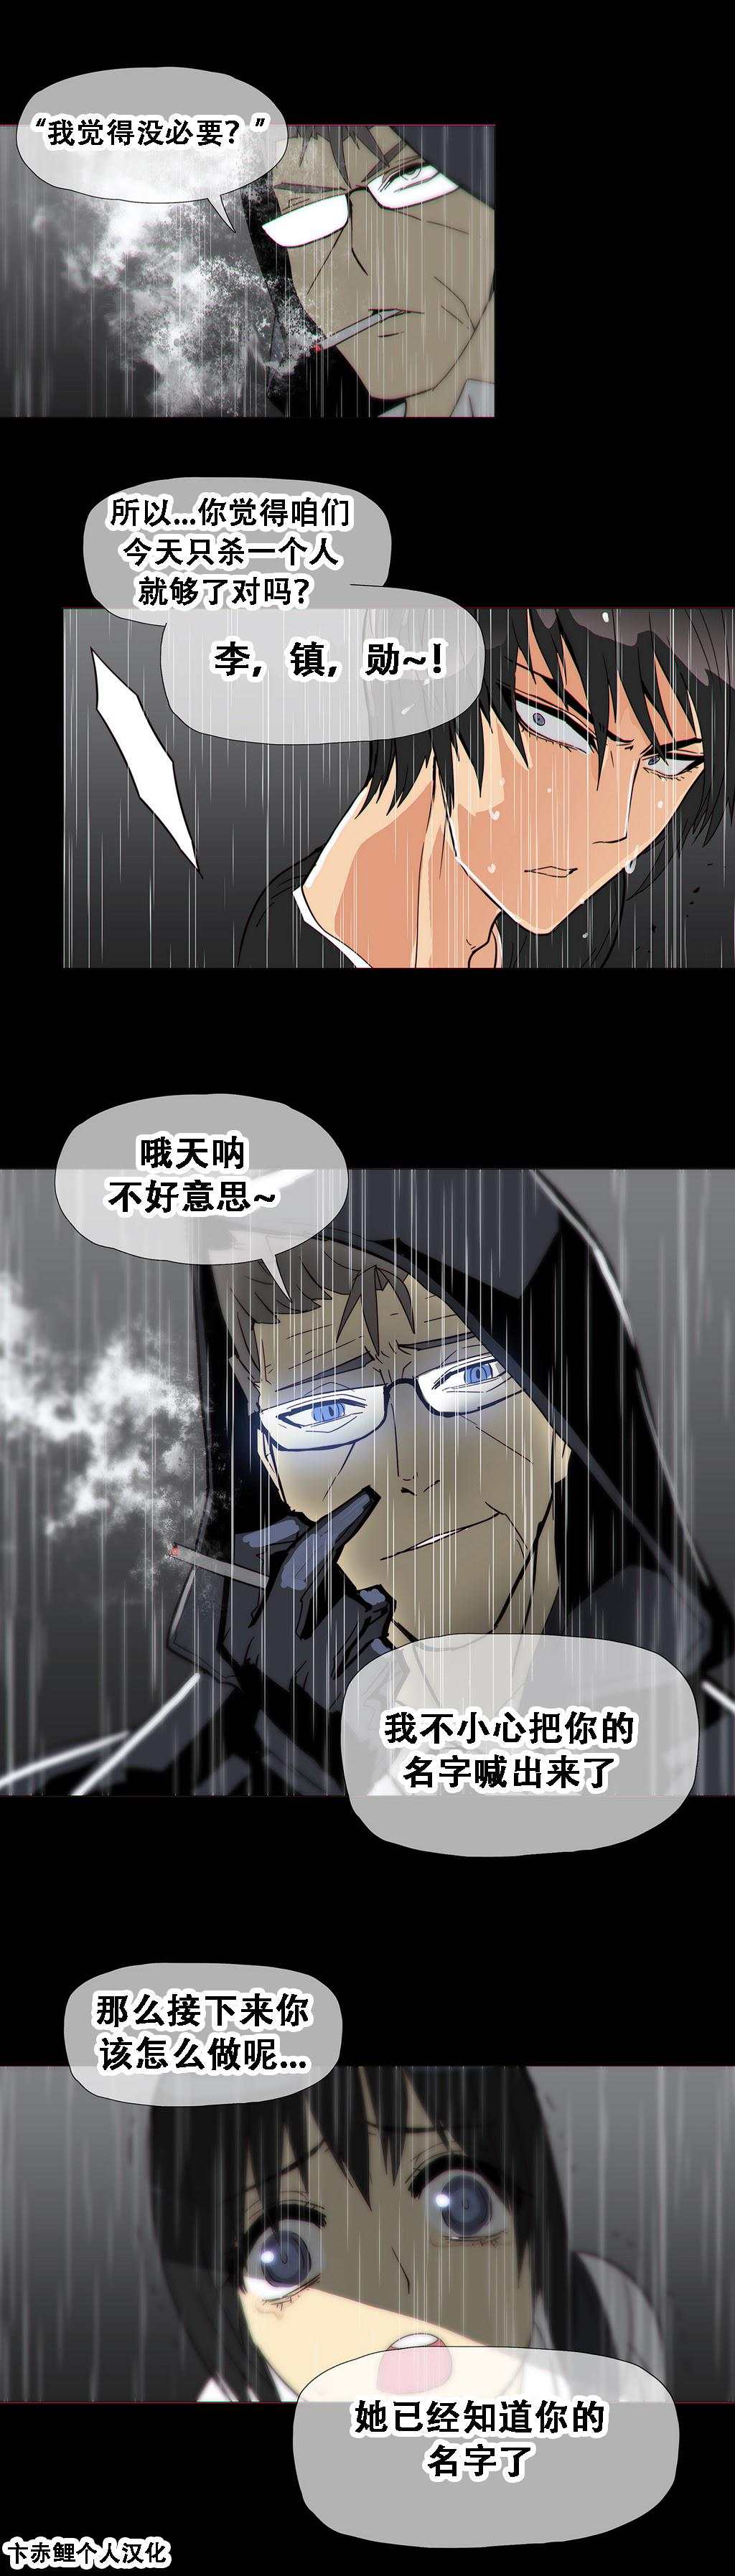 HouseHold Affairs 【卞赤鲤个人汉化】1~21话(持续更新中) 334